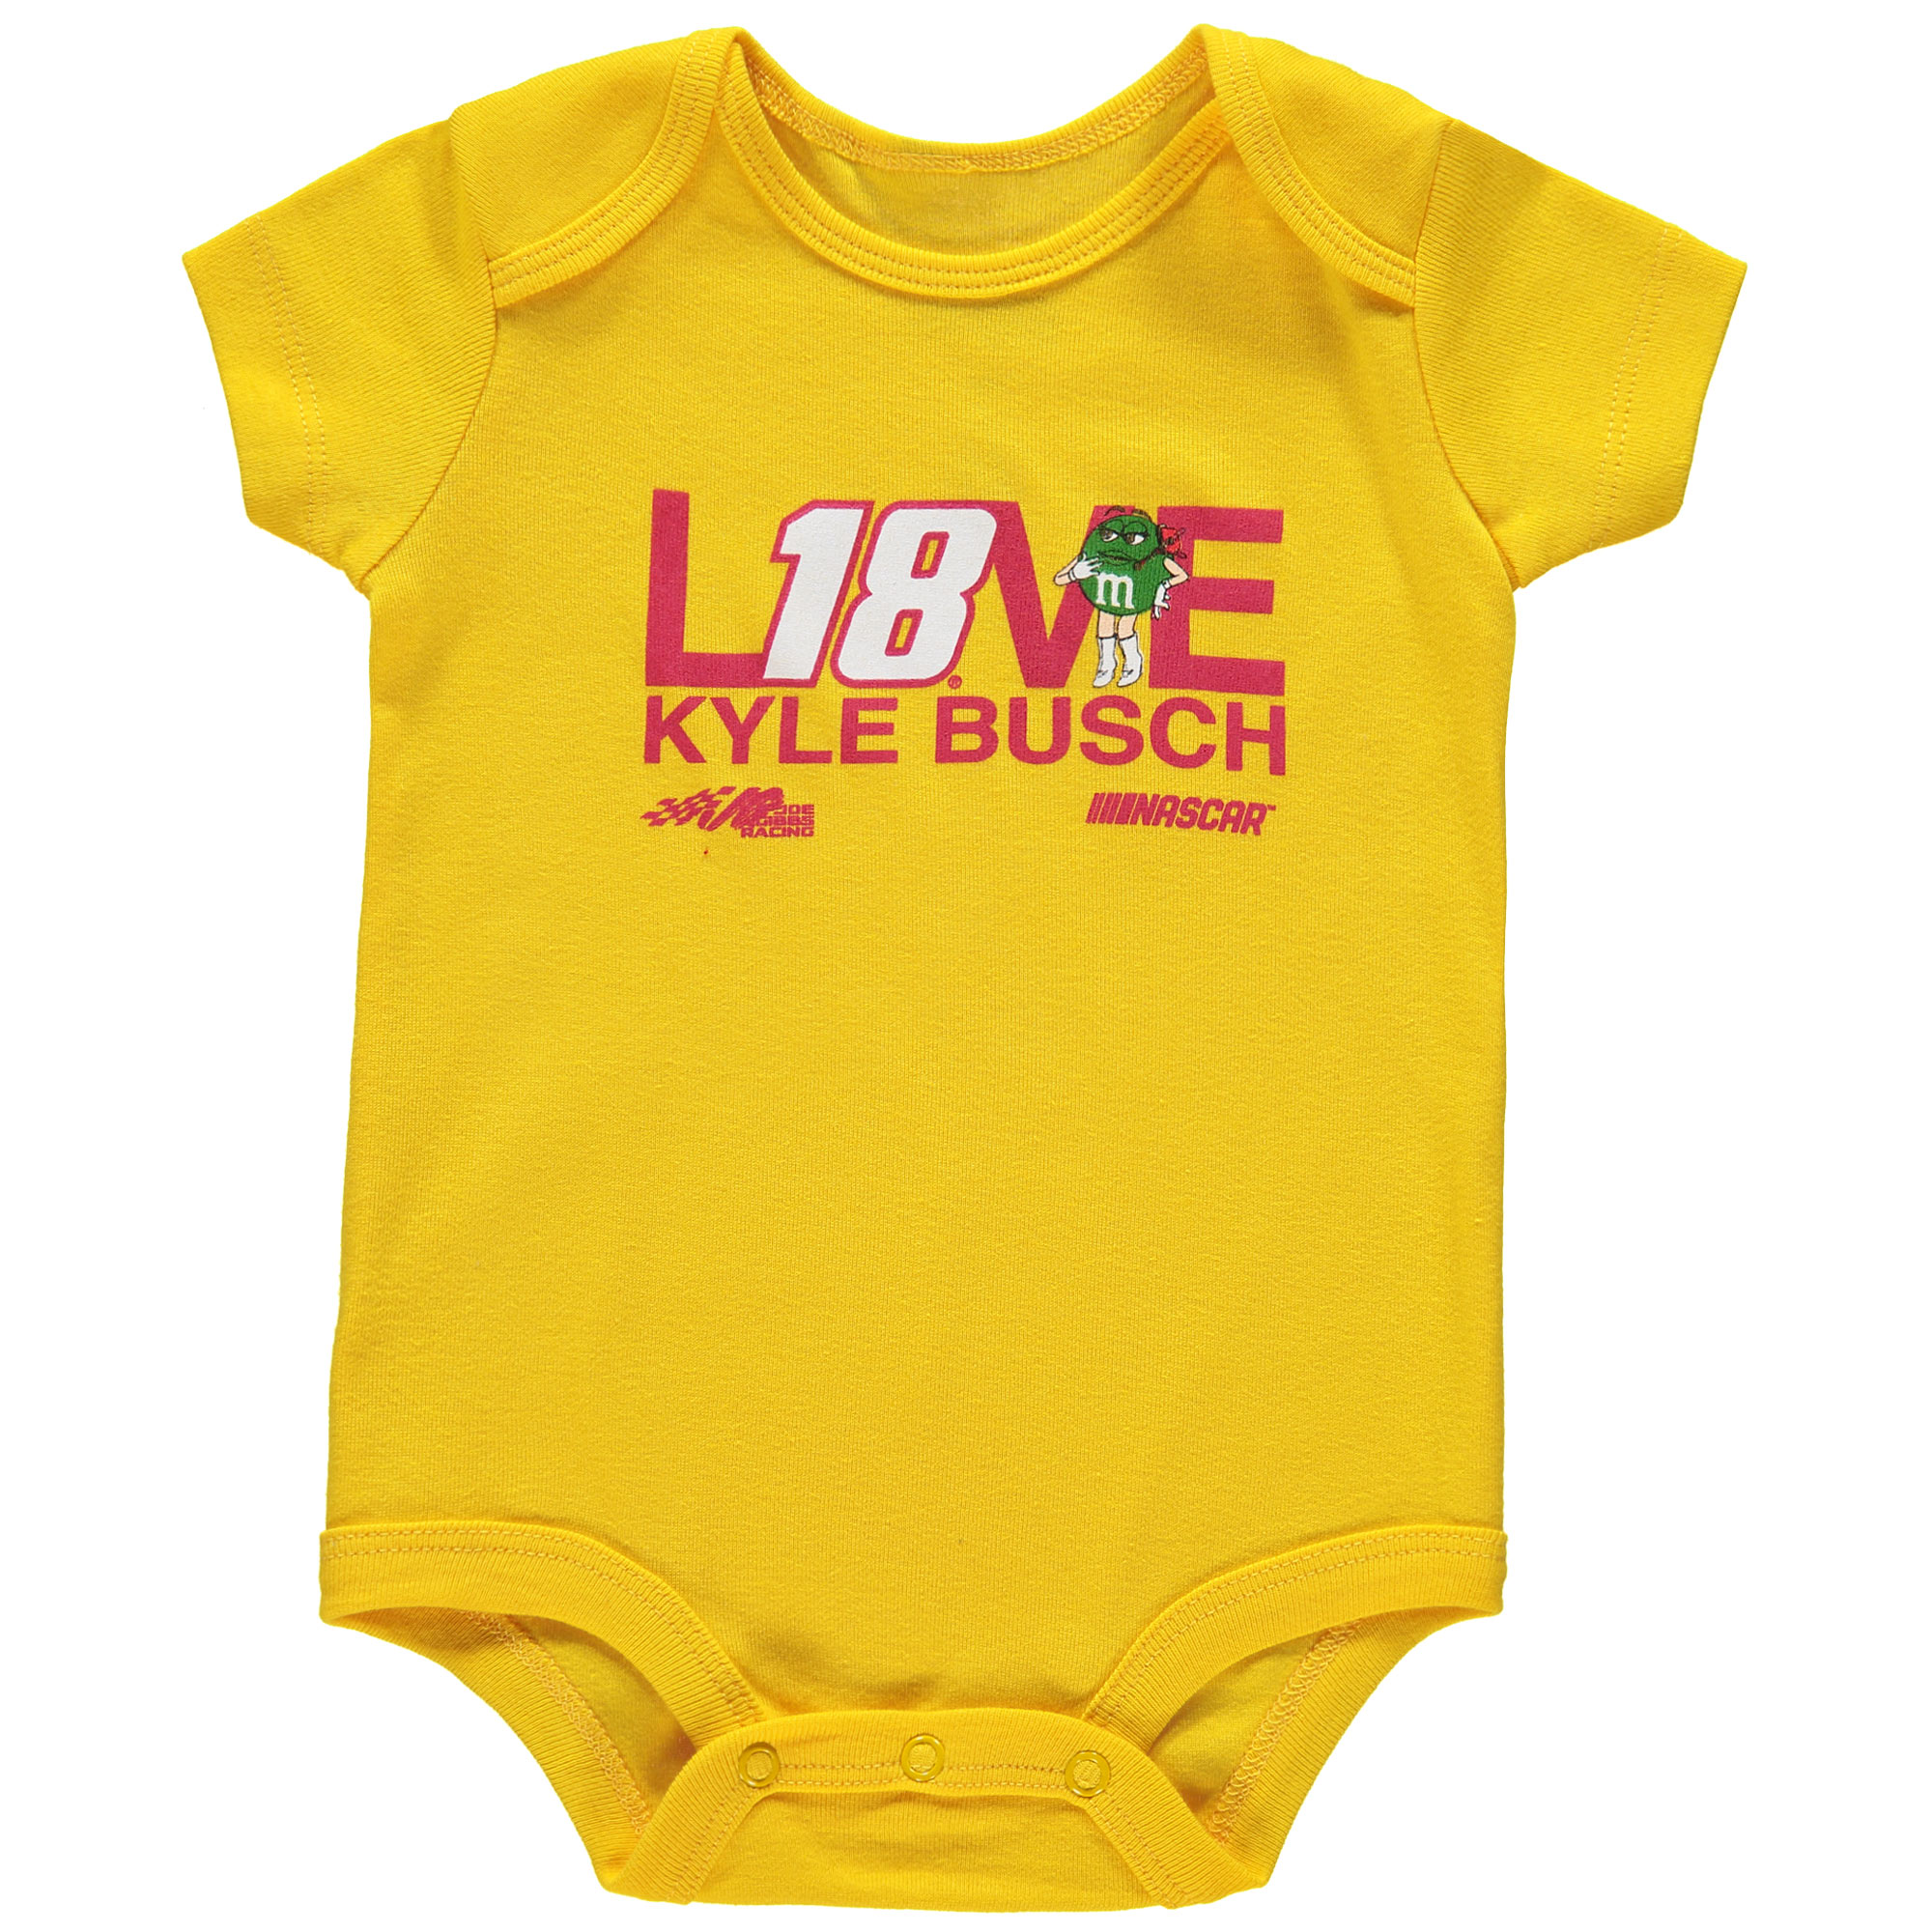 Kyle Busch Joe Gibbs Racing Team Collection Girls Newborn & Infant Bodysuit - Yellow